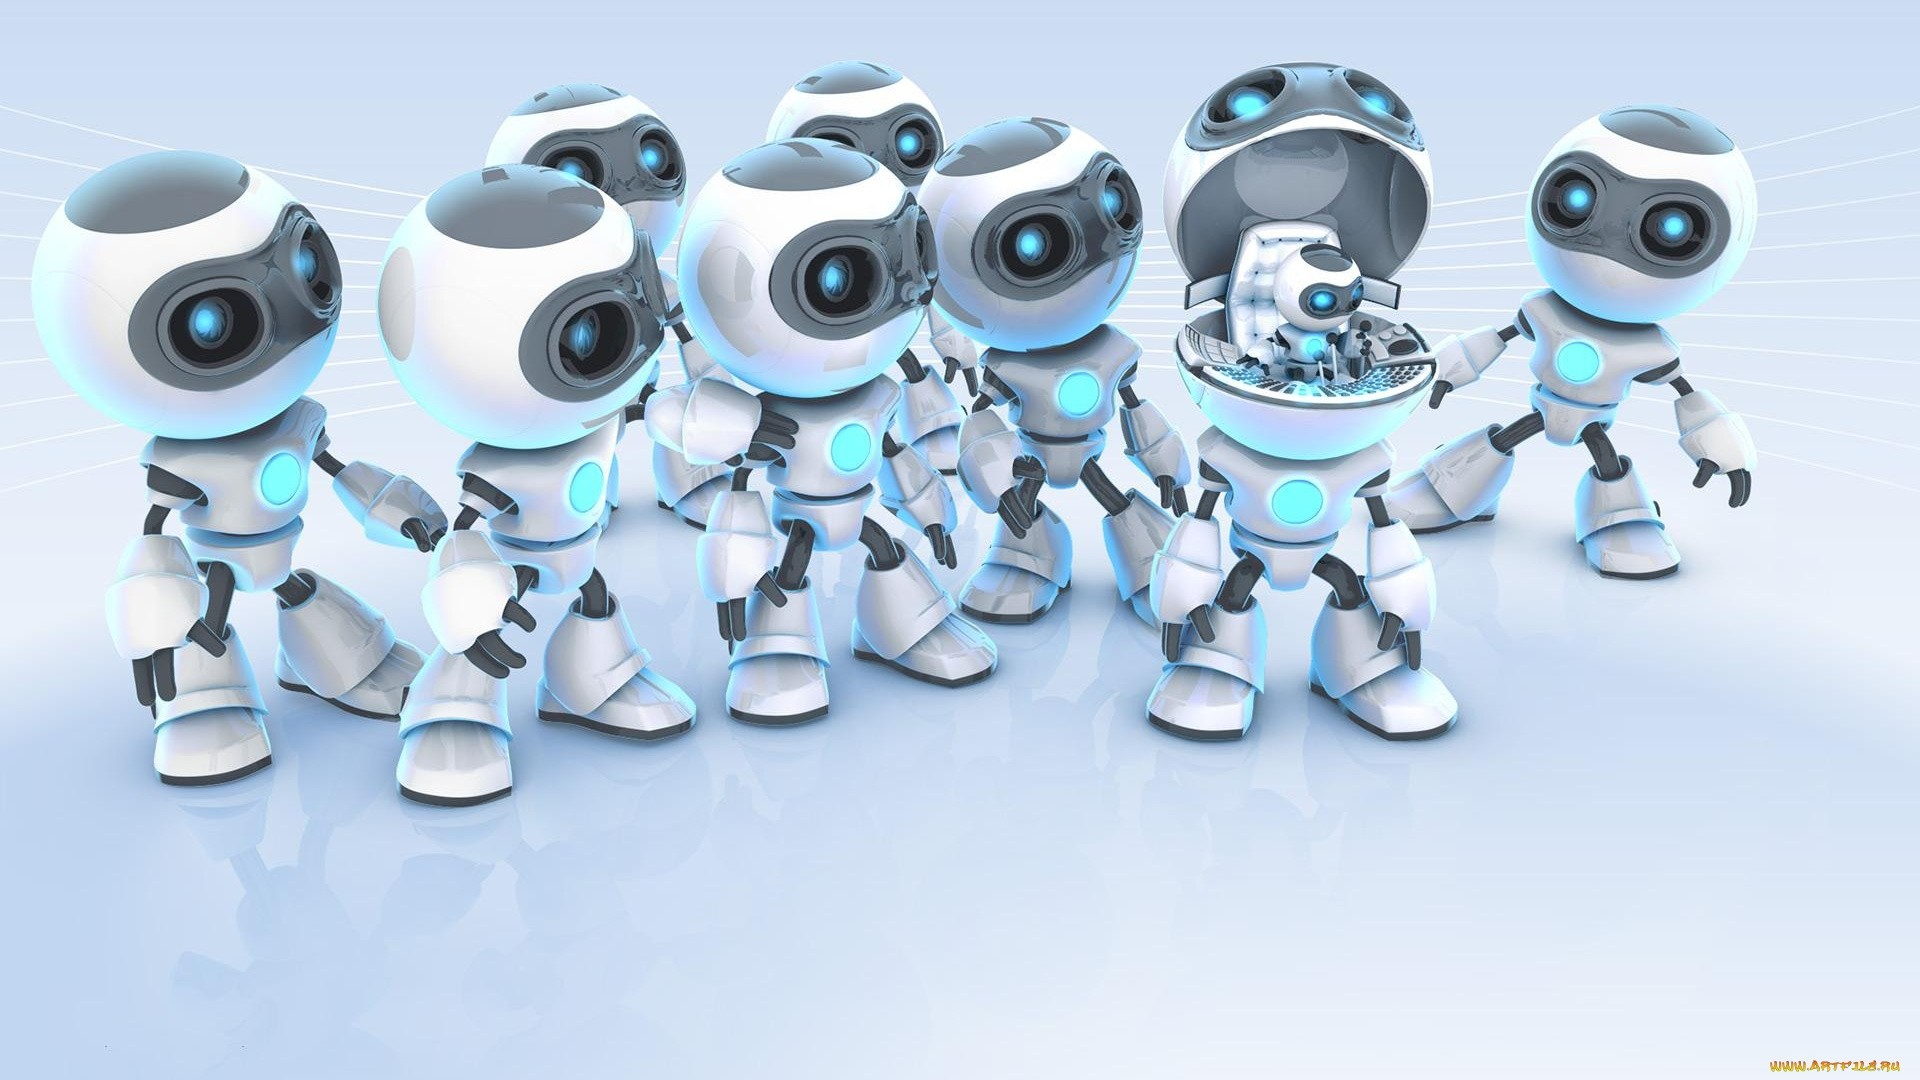 Robot Free Wallpaper